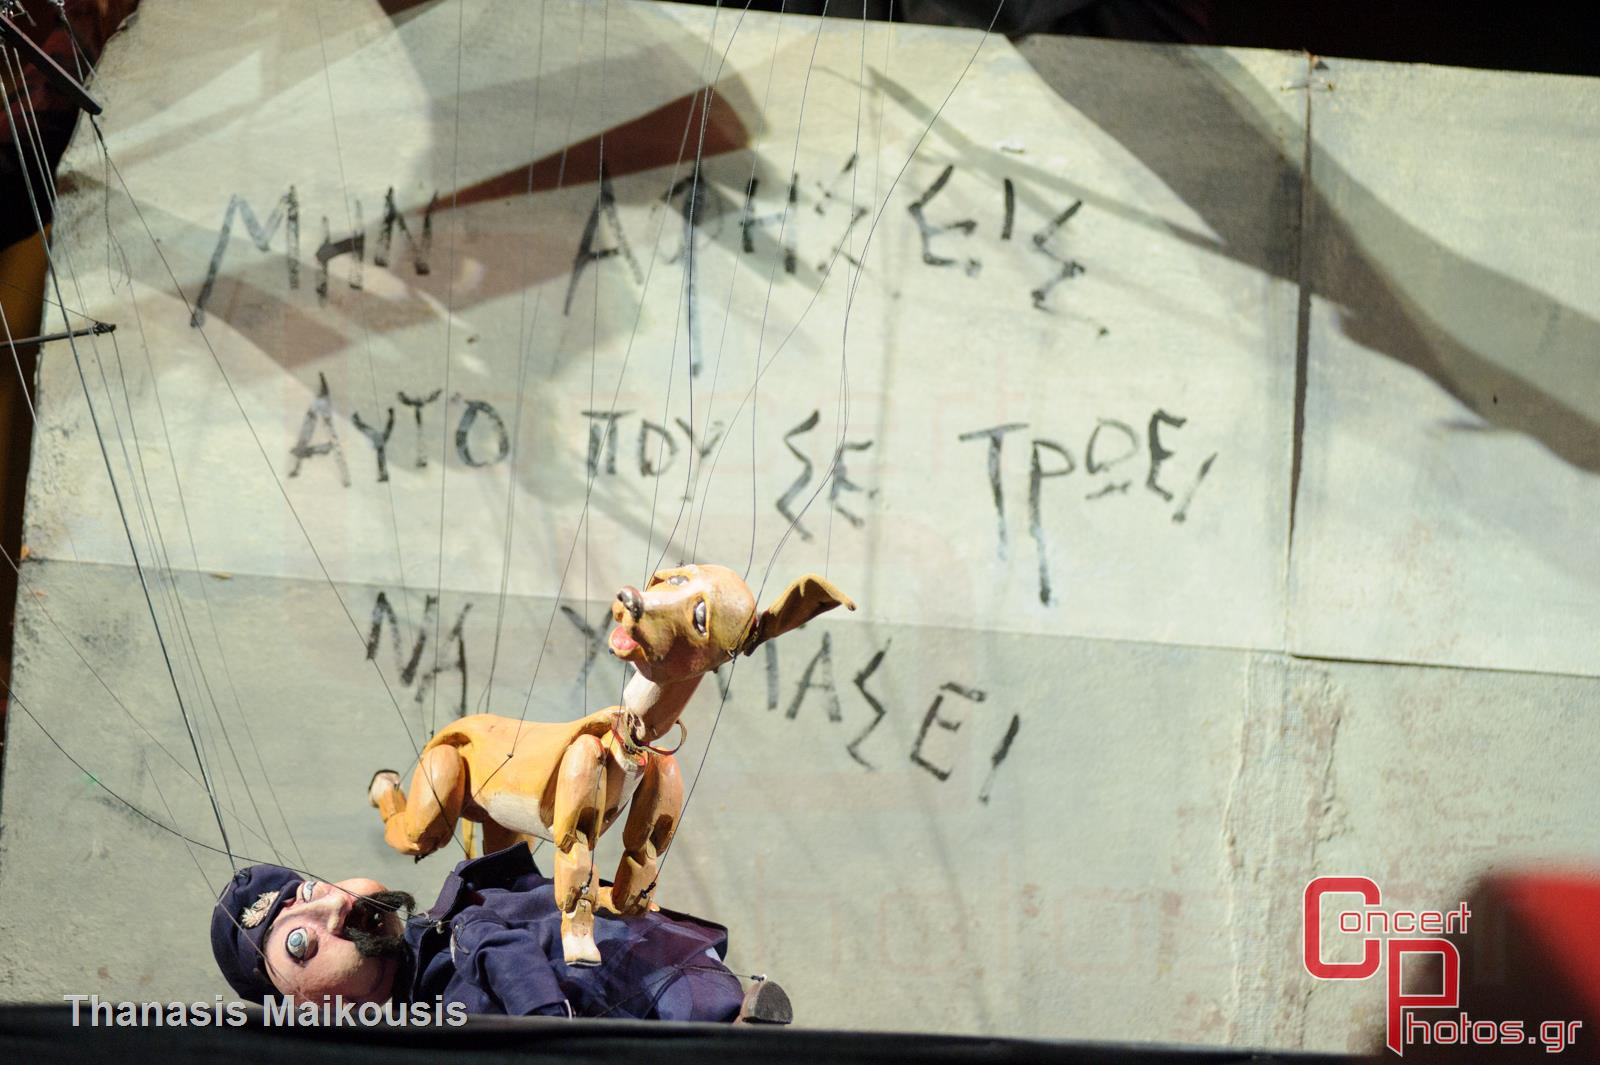 Active Member - Τραγούδα μας να φύγει το σκοτάδι- photographer: Thanasis Maikousis - concertphotos_-5069